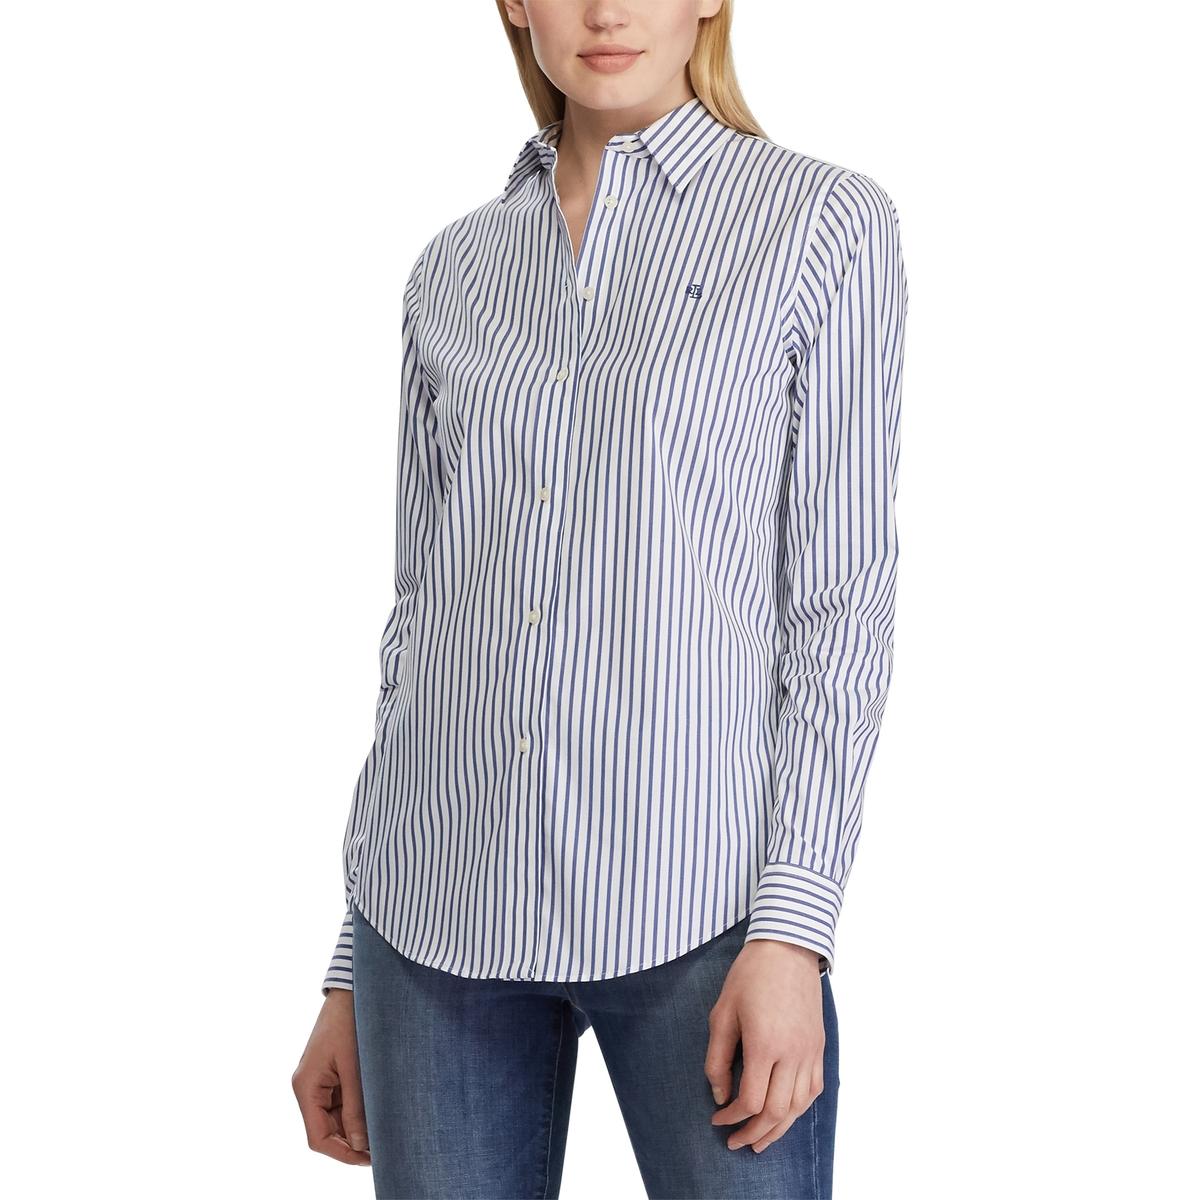 Рубашка La Redoute В полоску с длинными рукавами S синий цена 2017